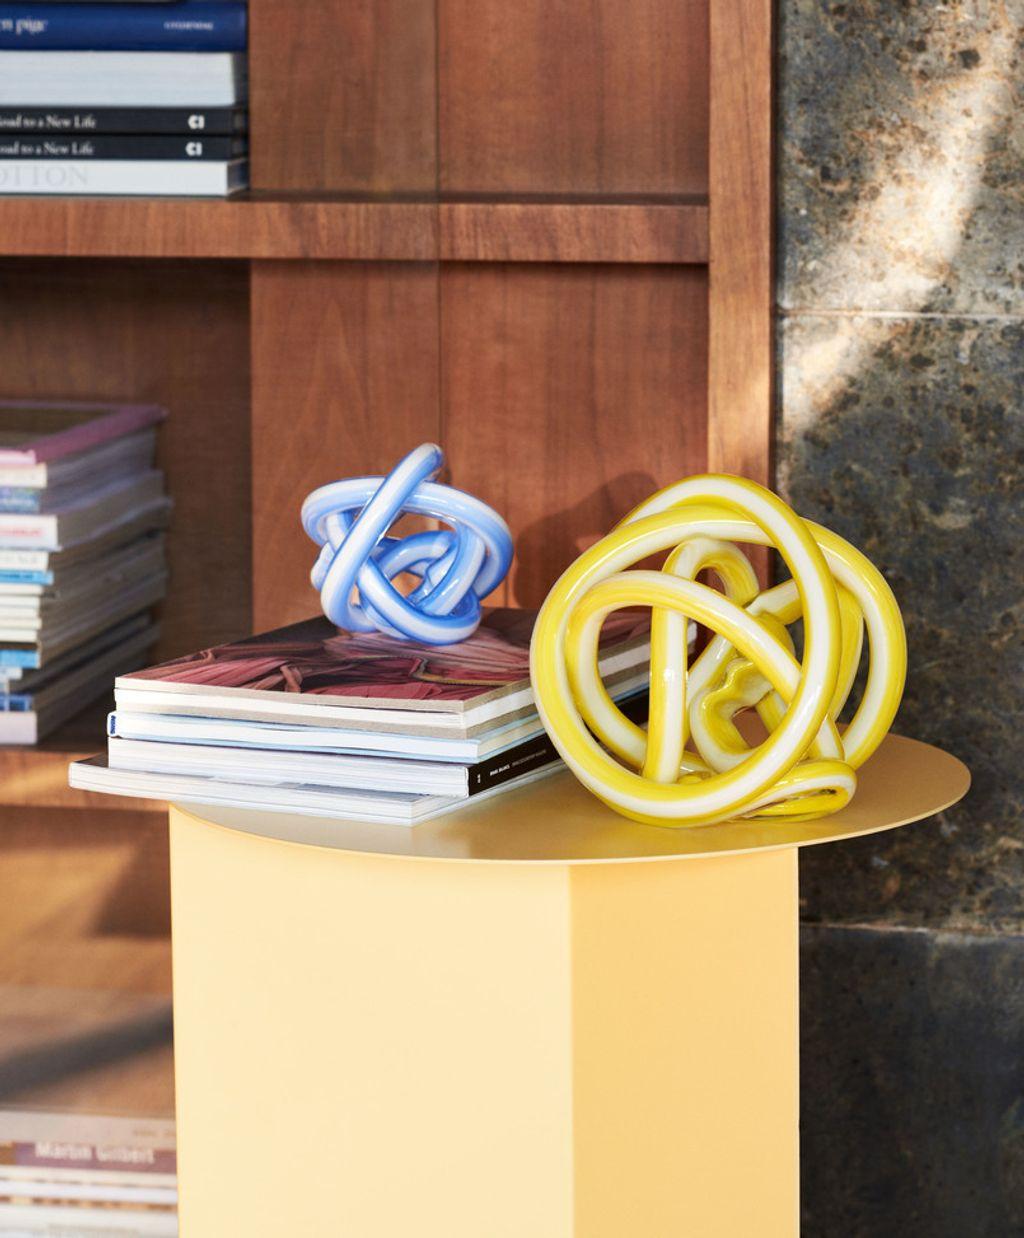 Knot S light blue_Knot M yellow_Slit Table.jpg